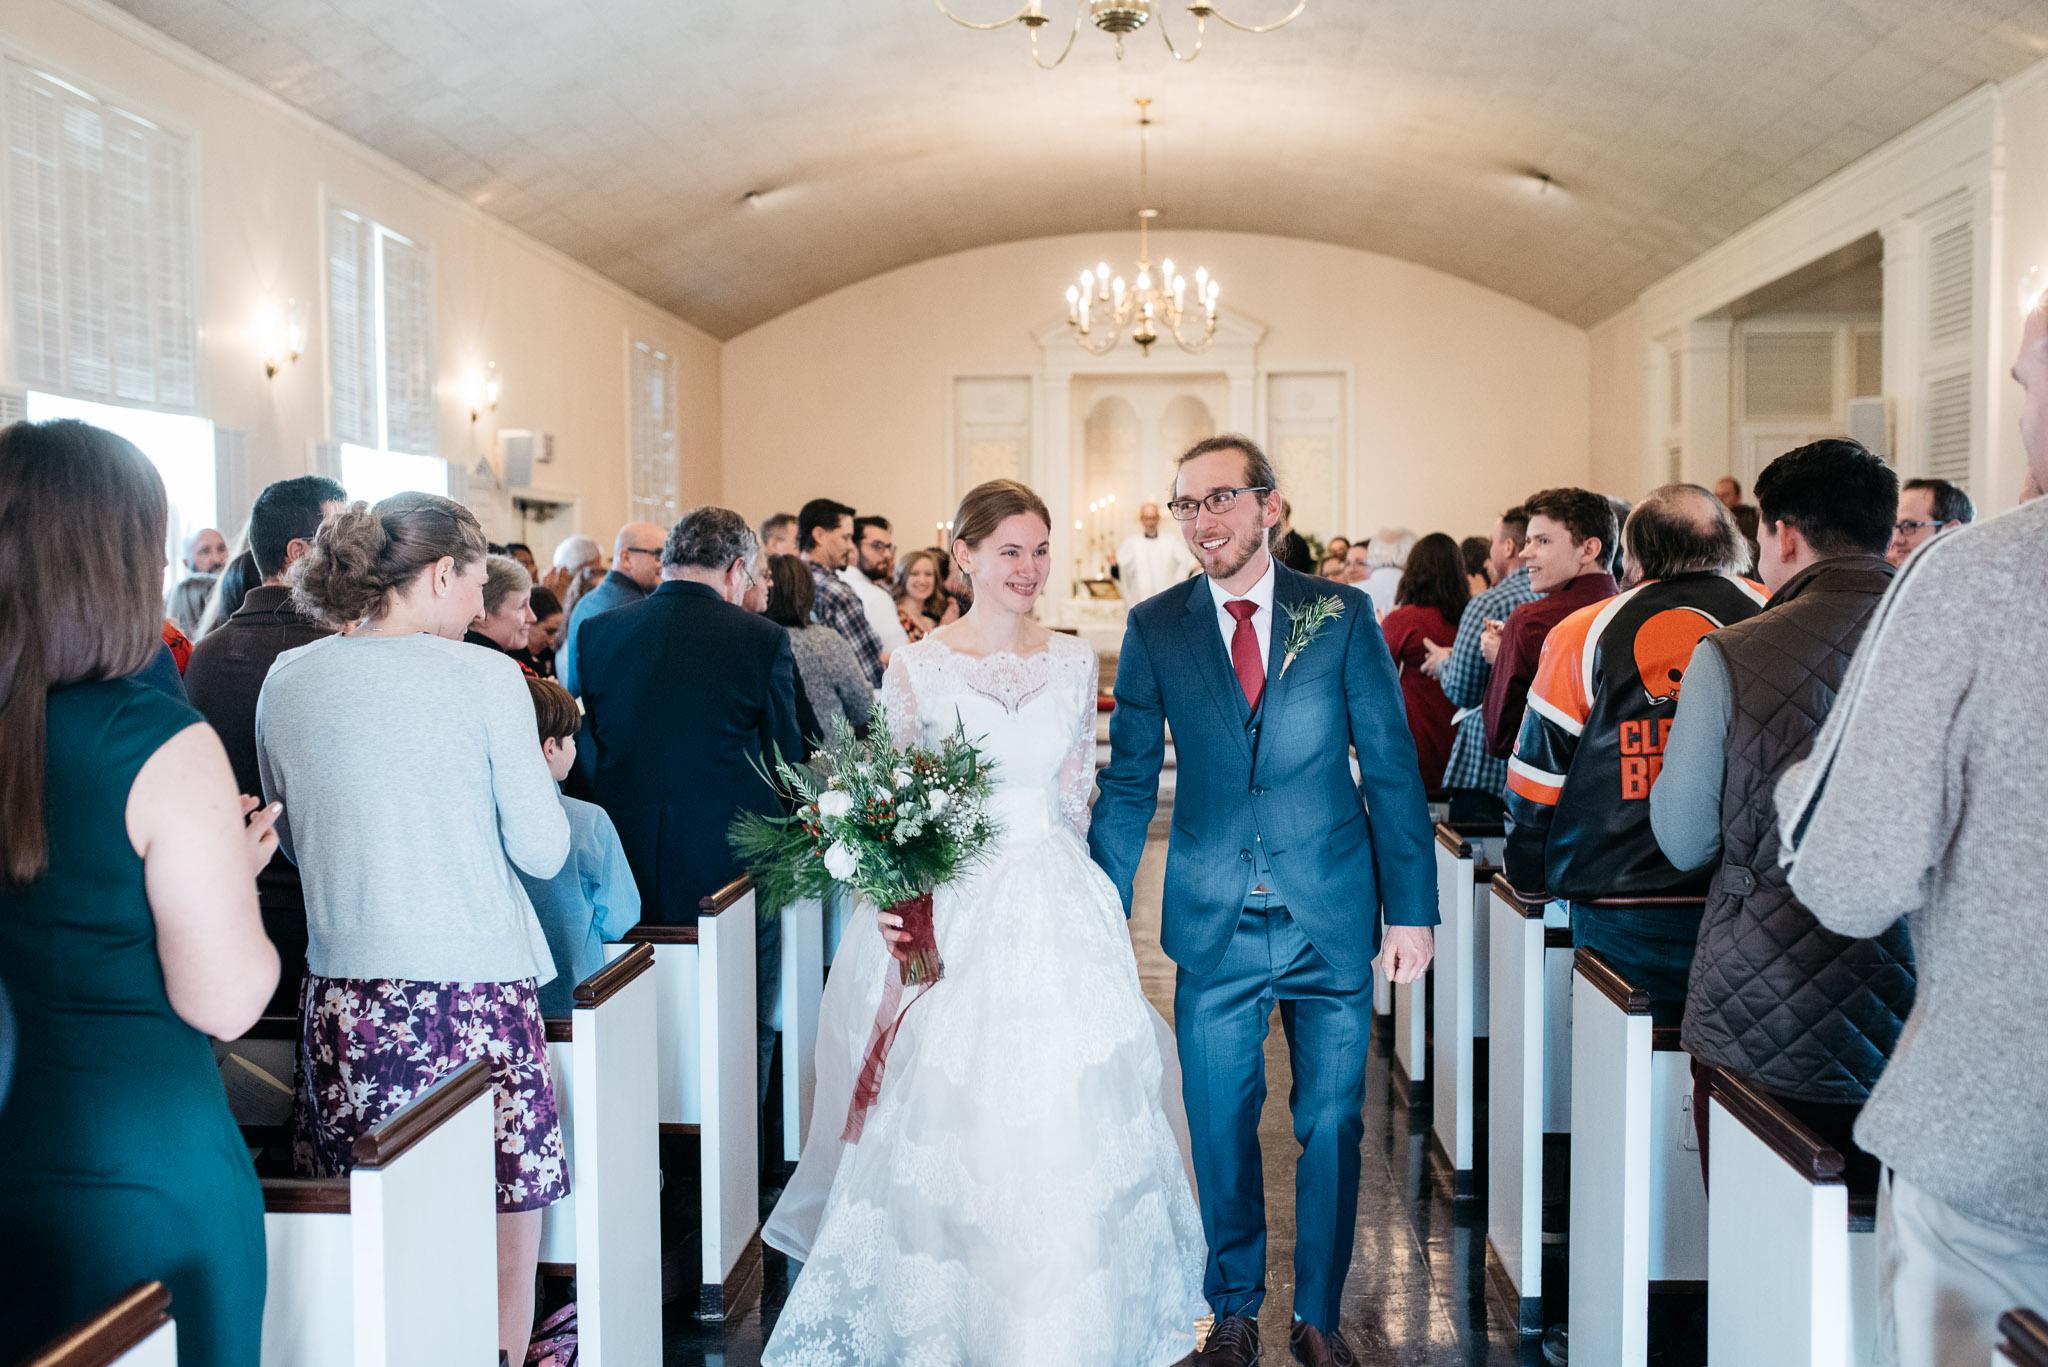 St Michaels Church wedding ceremony, Ligonier Wedding Photographer-6440.jpg